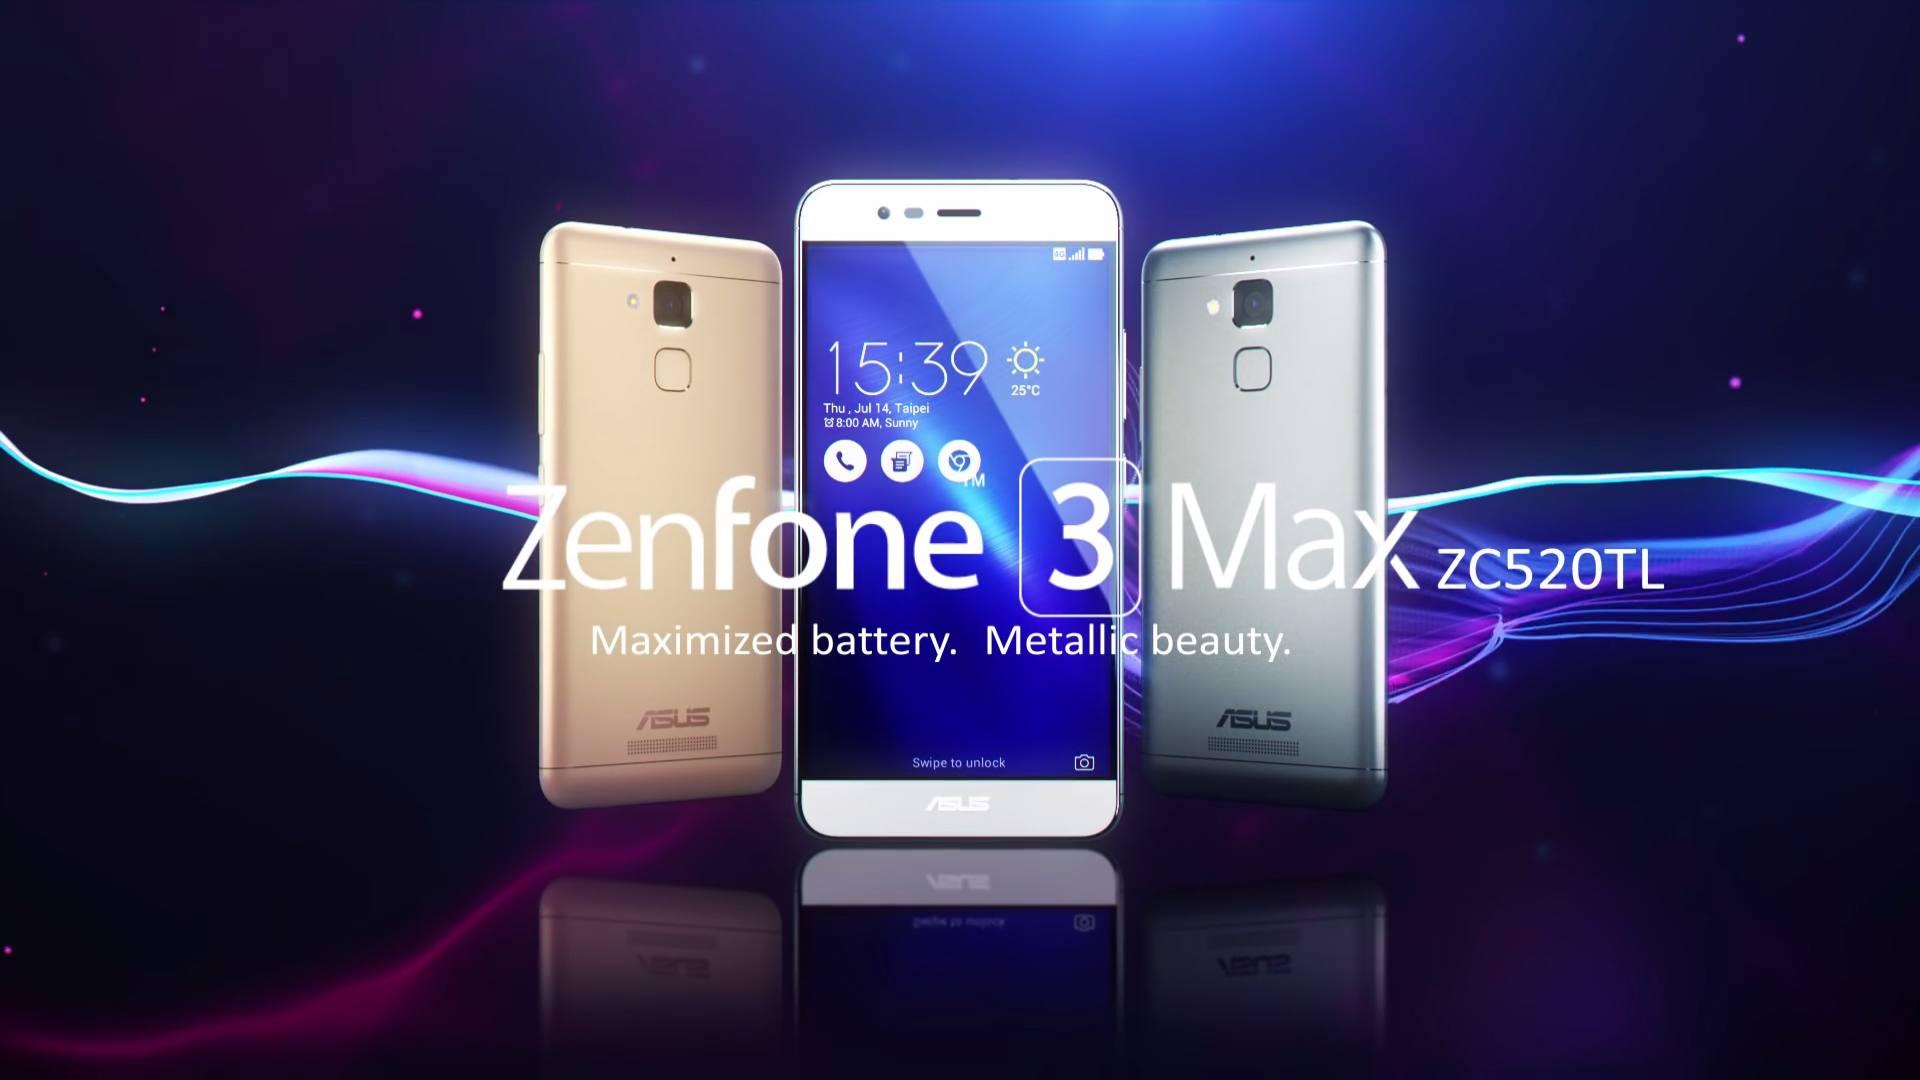 zenfone-3-max-youtu-be-thxapnl8fjy